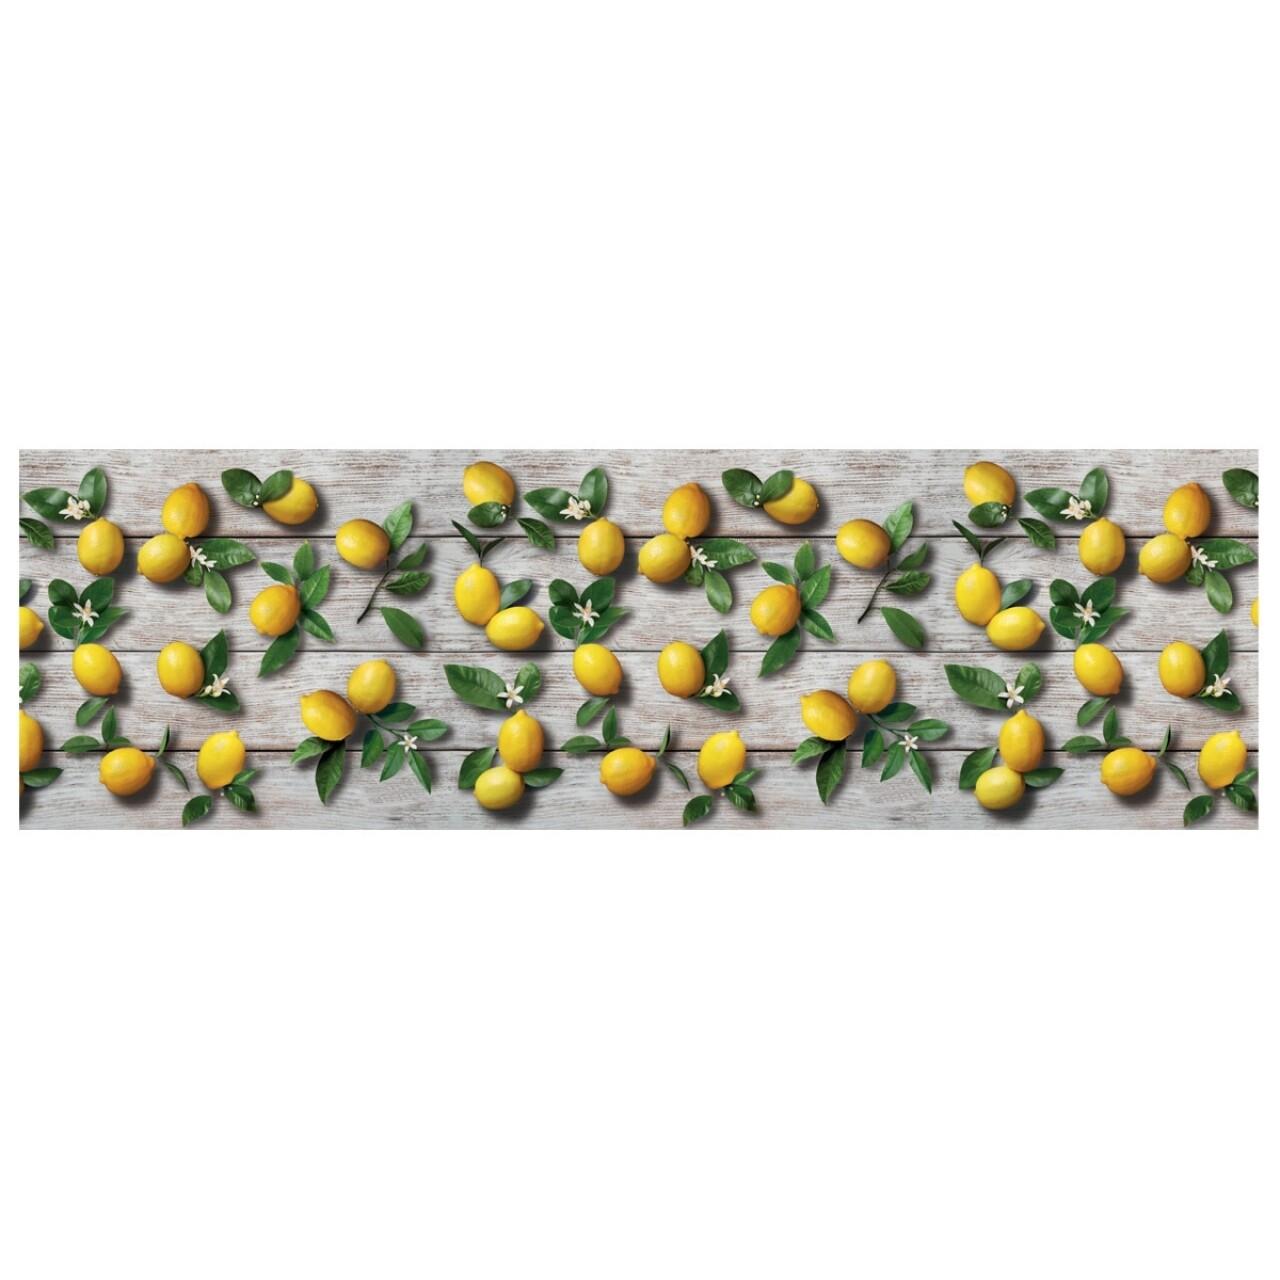 Covor rezistent Webtappeti Limoni 58 x 190 cm, gri/galben/verde